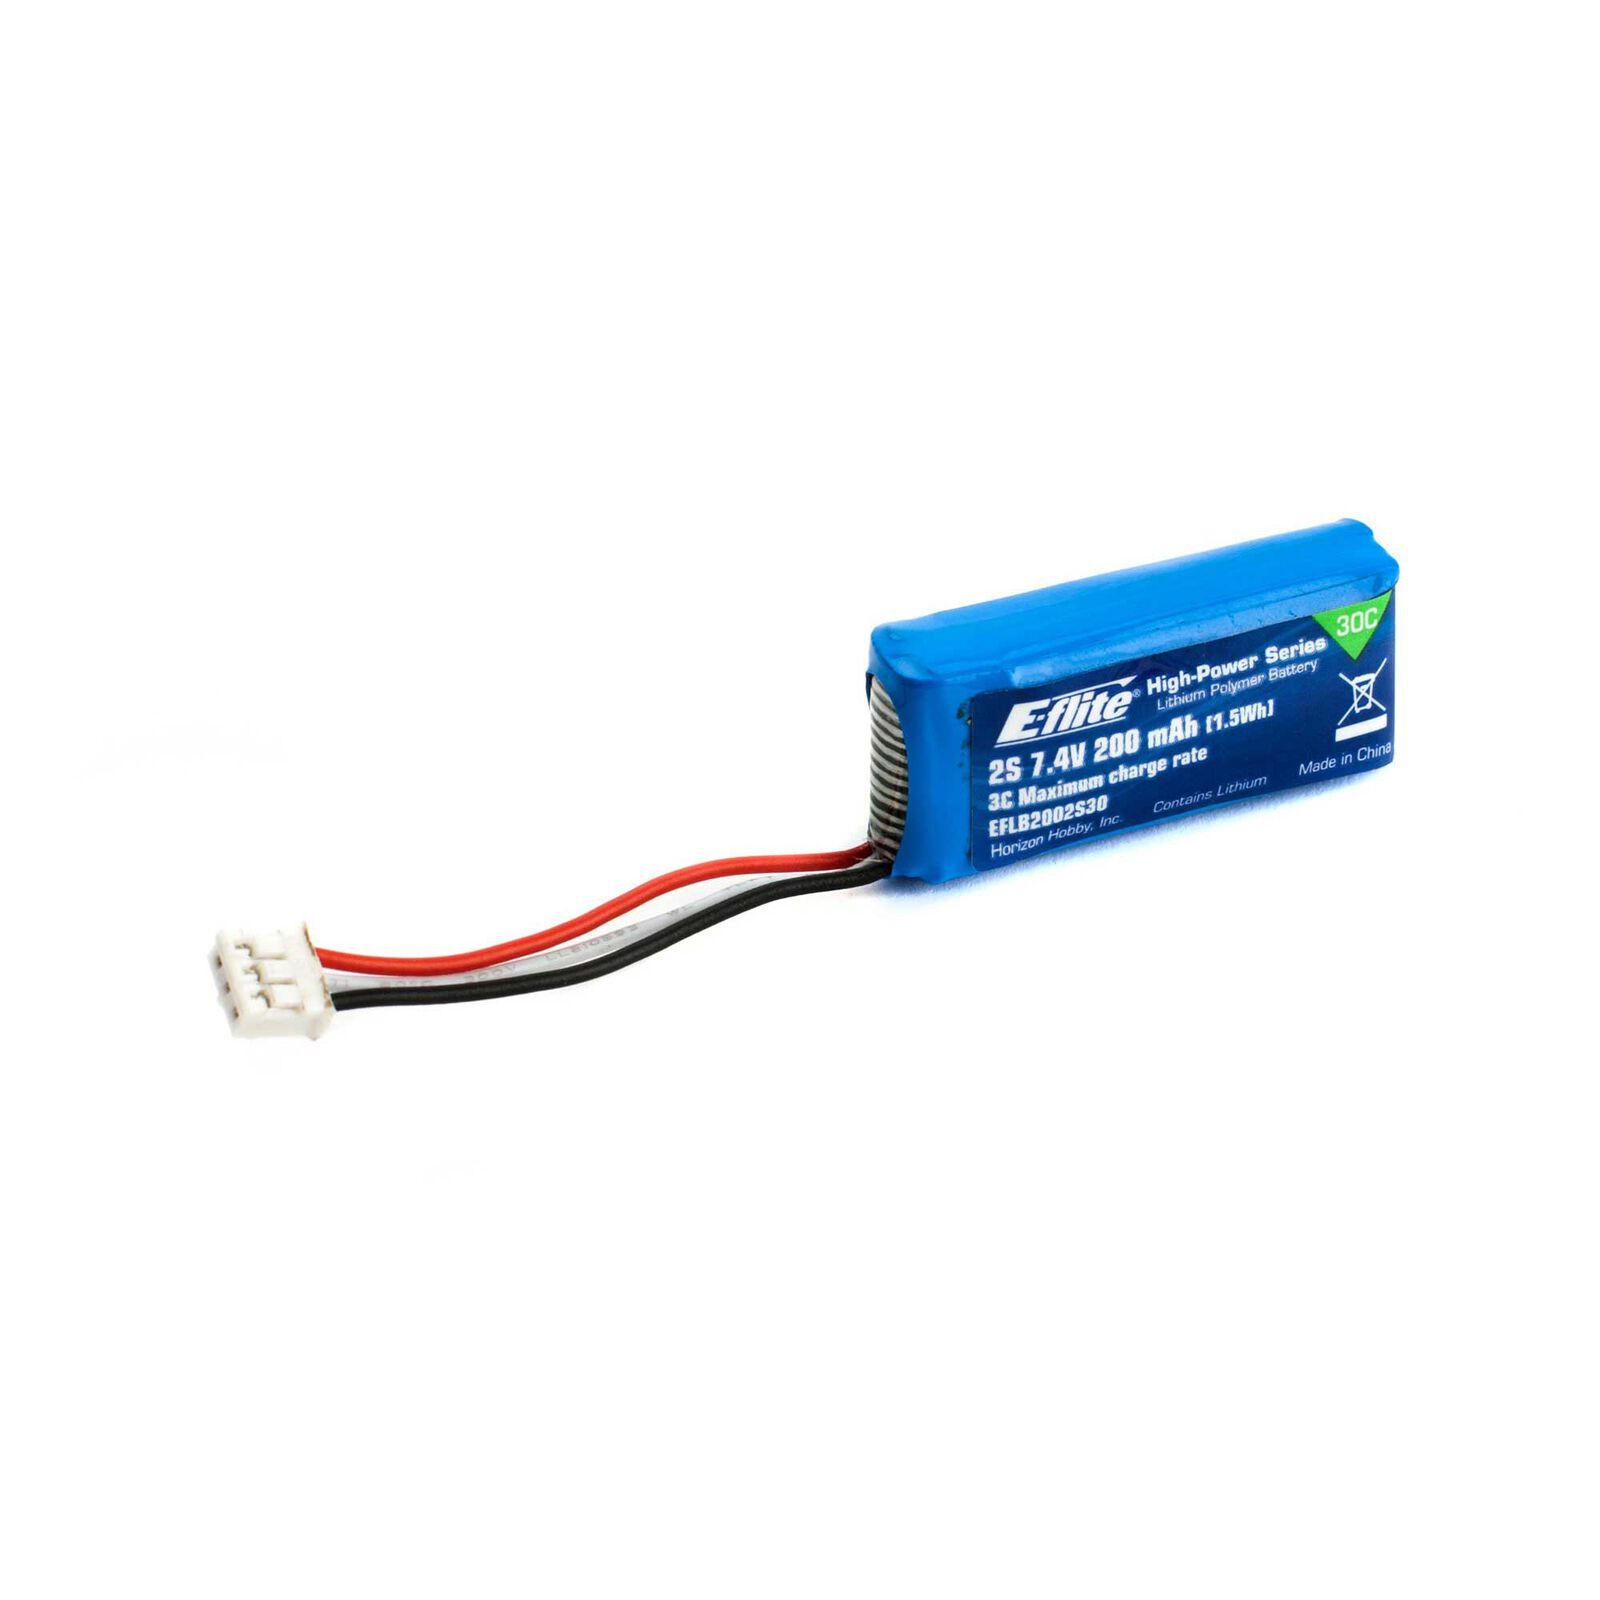 7.4V 200mAh 2S 30C LiPo Battery: PH